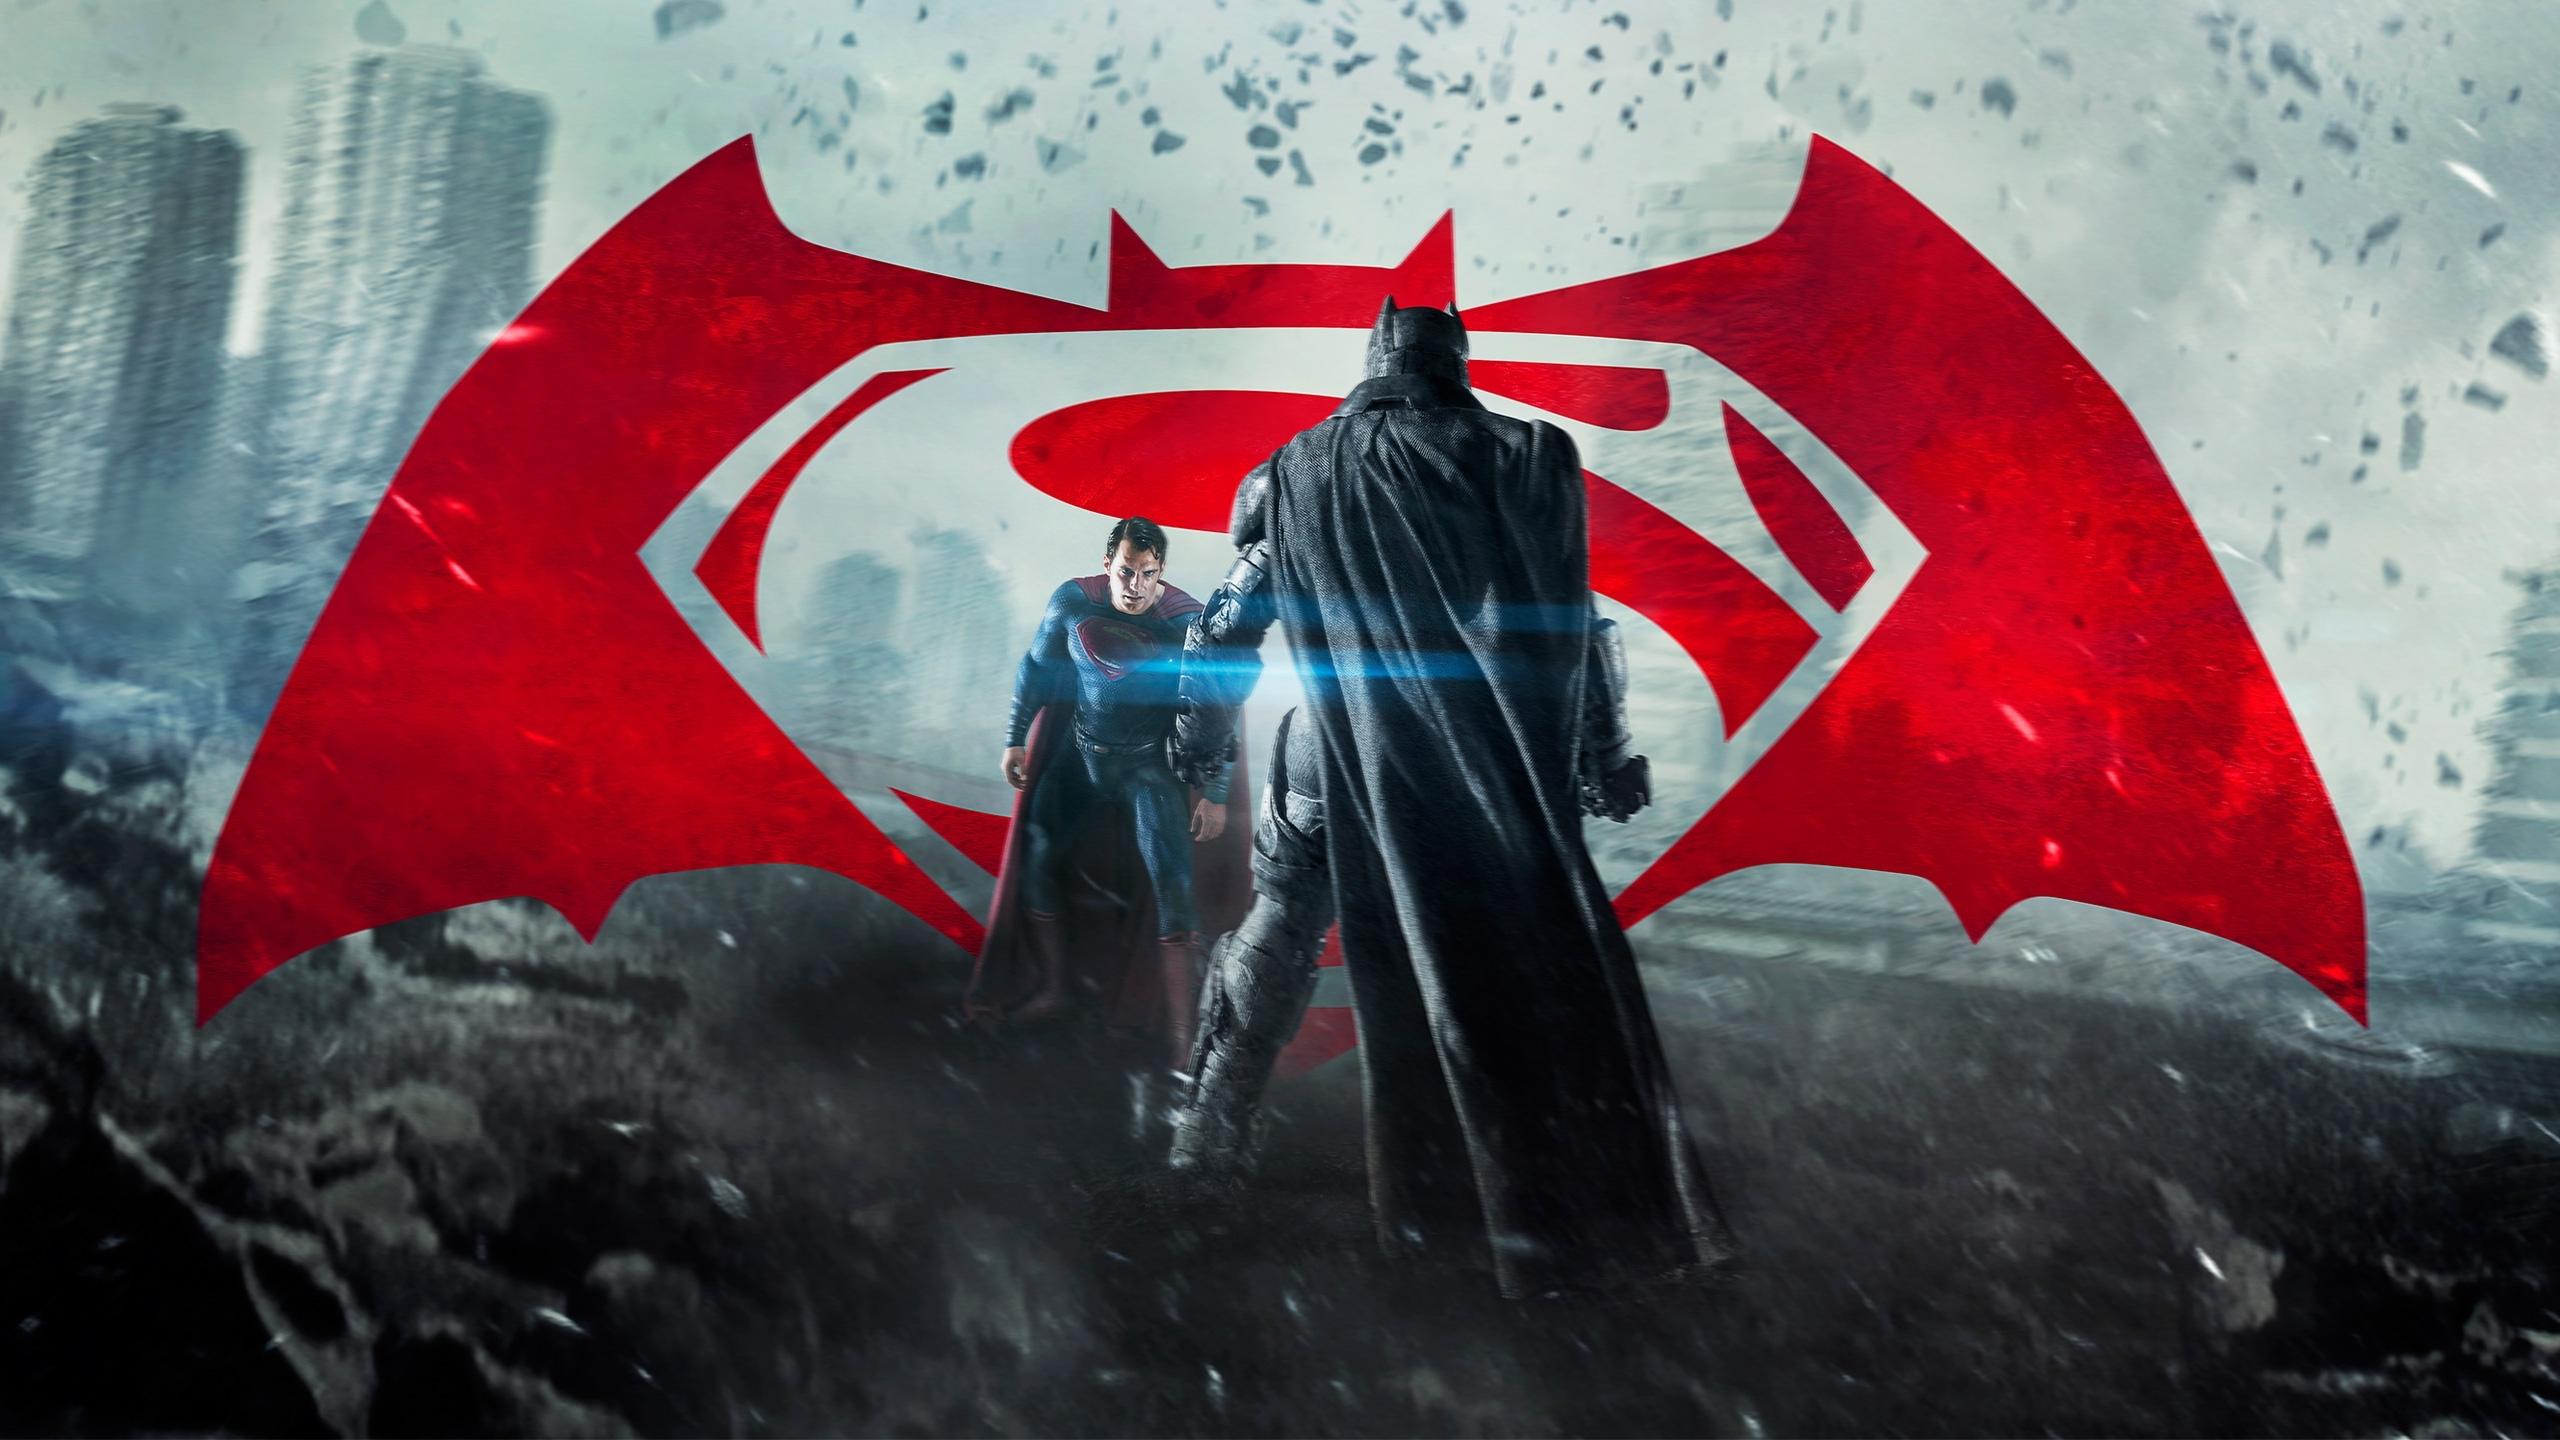 batman v superman dawn of justice hd wallpapers | hd wallpapers | id